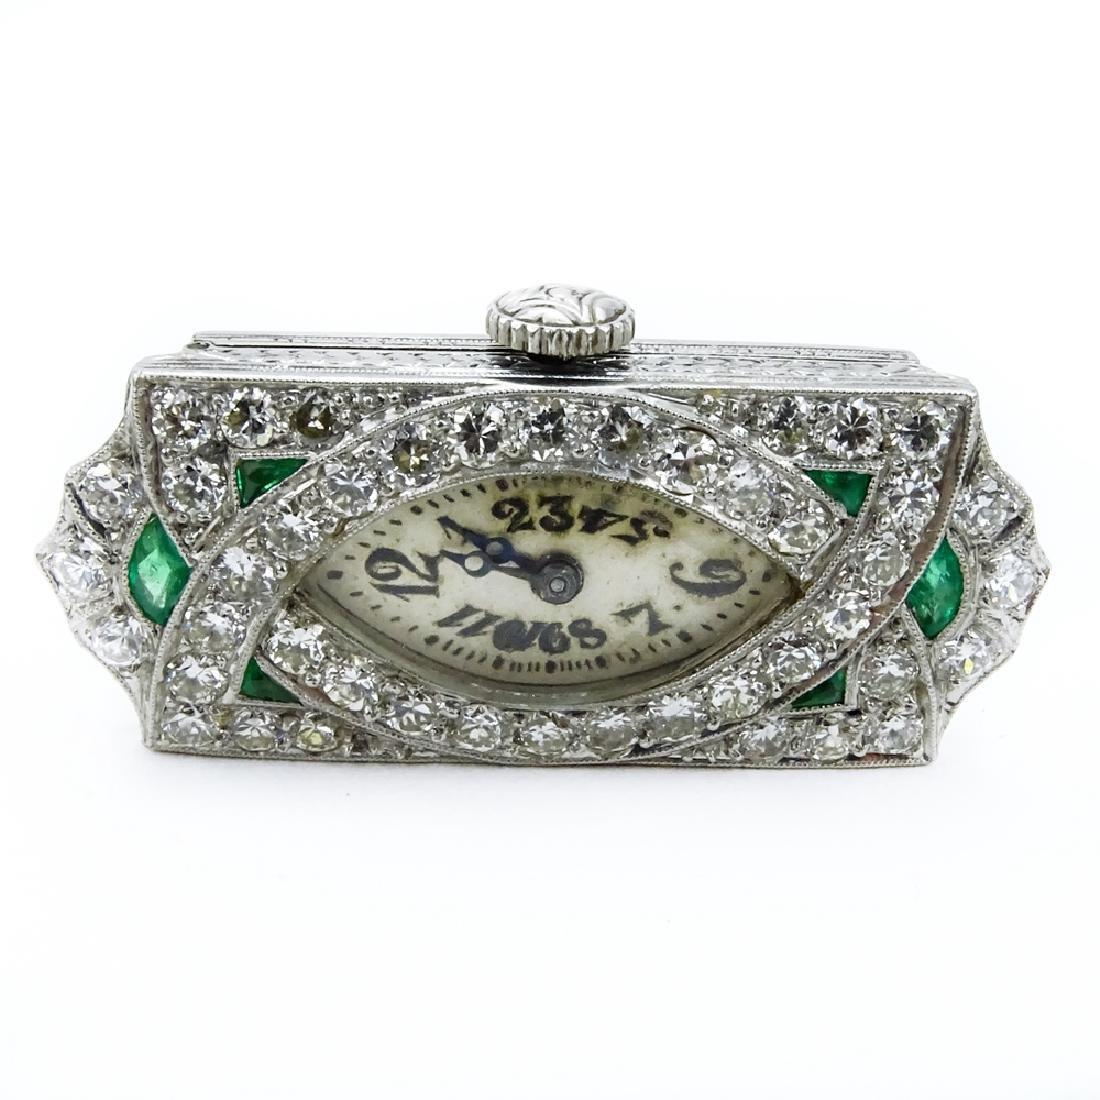 Art Deco Approx. 2.0 Carat Diamond, Emerald and